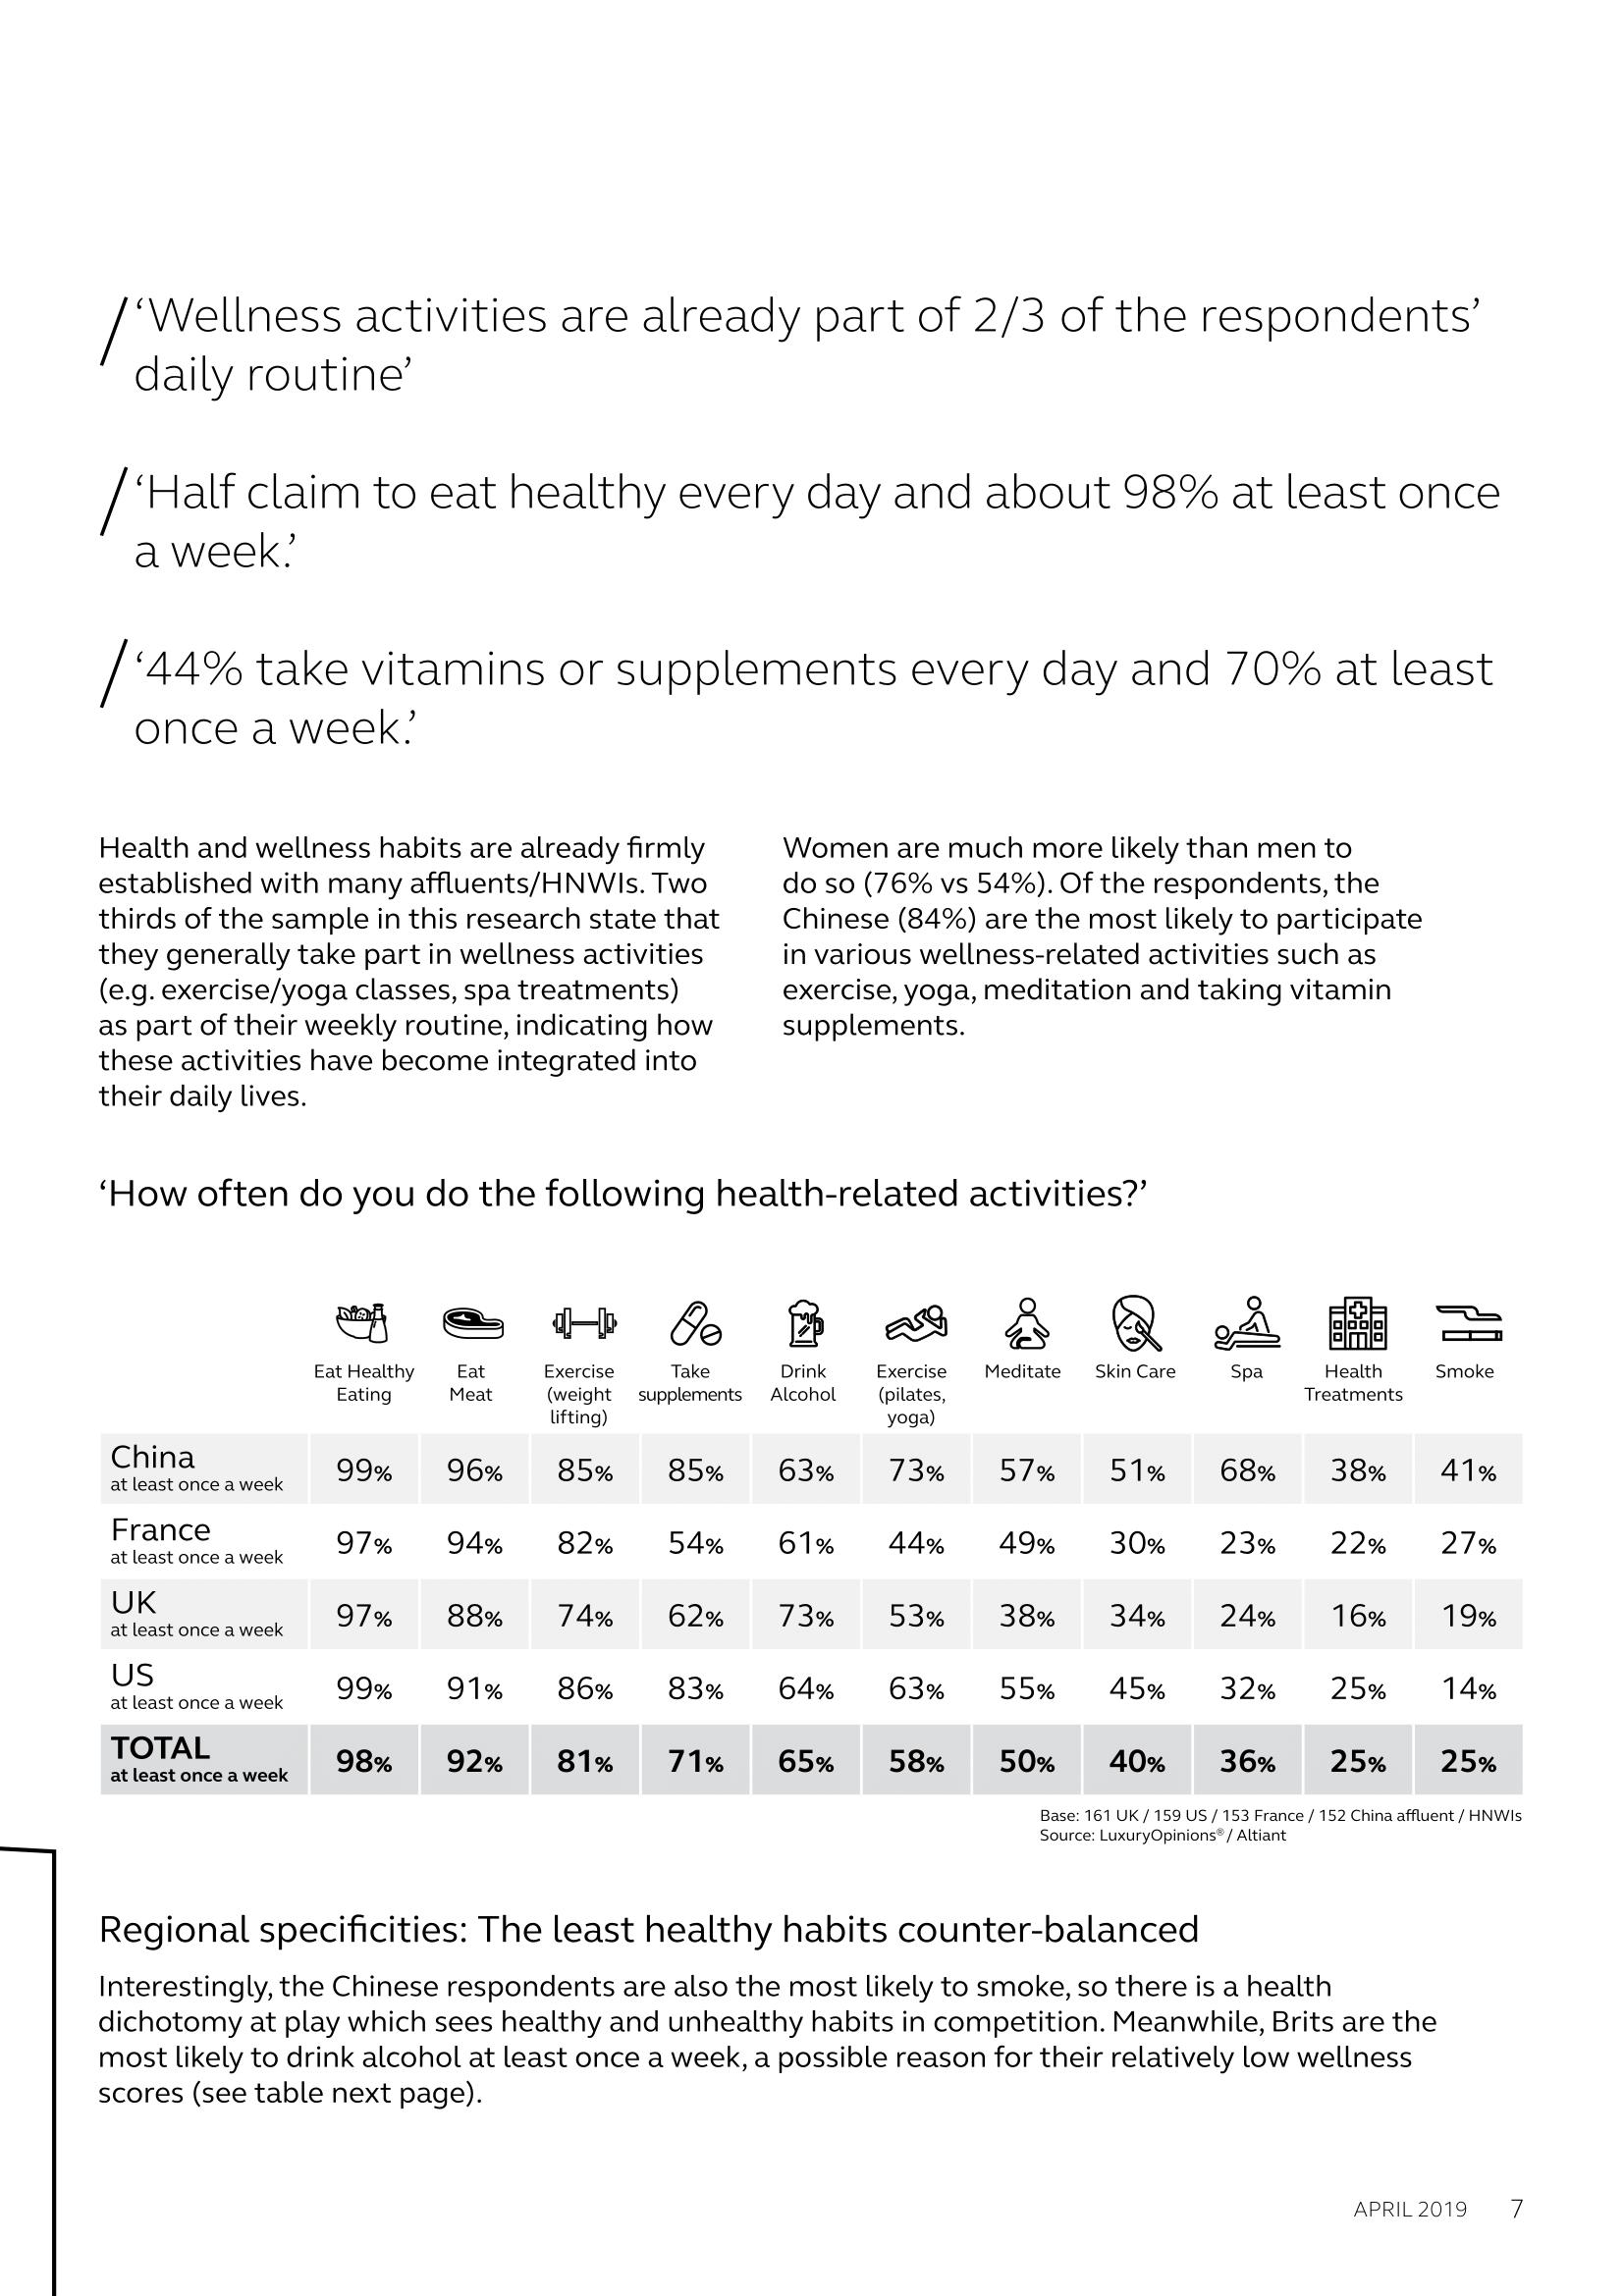 ILTM_Altiant_Report-07.png